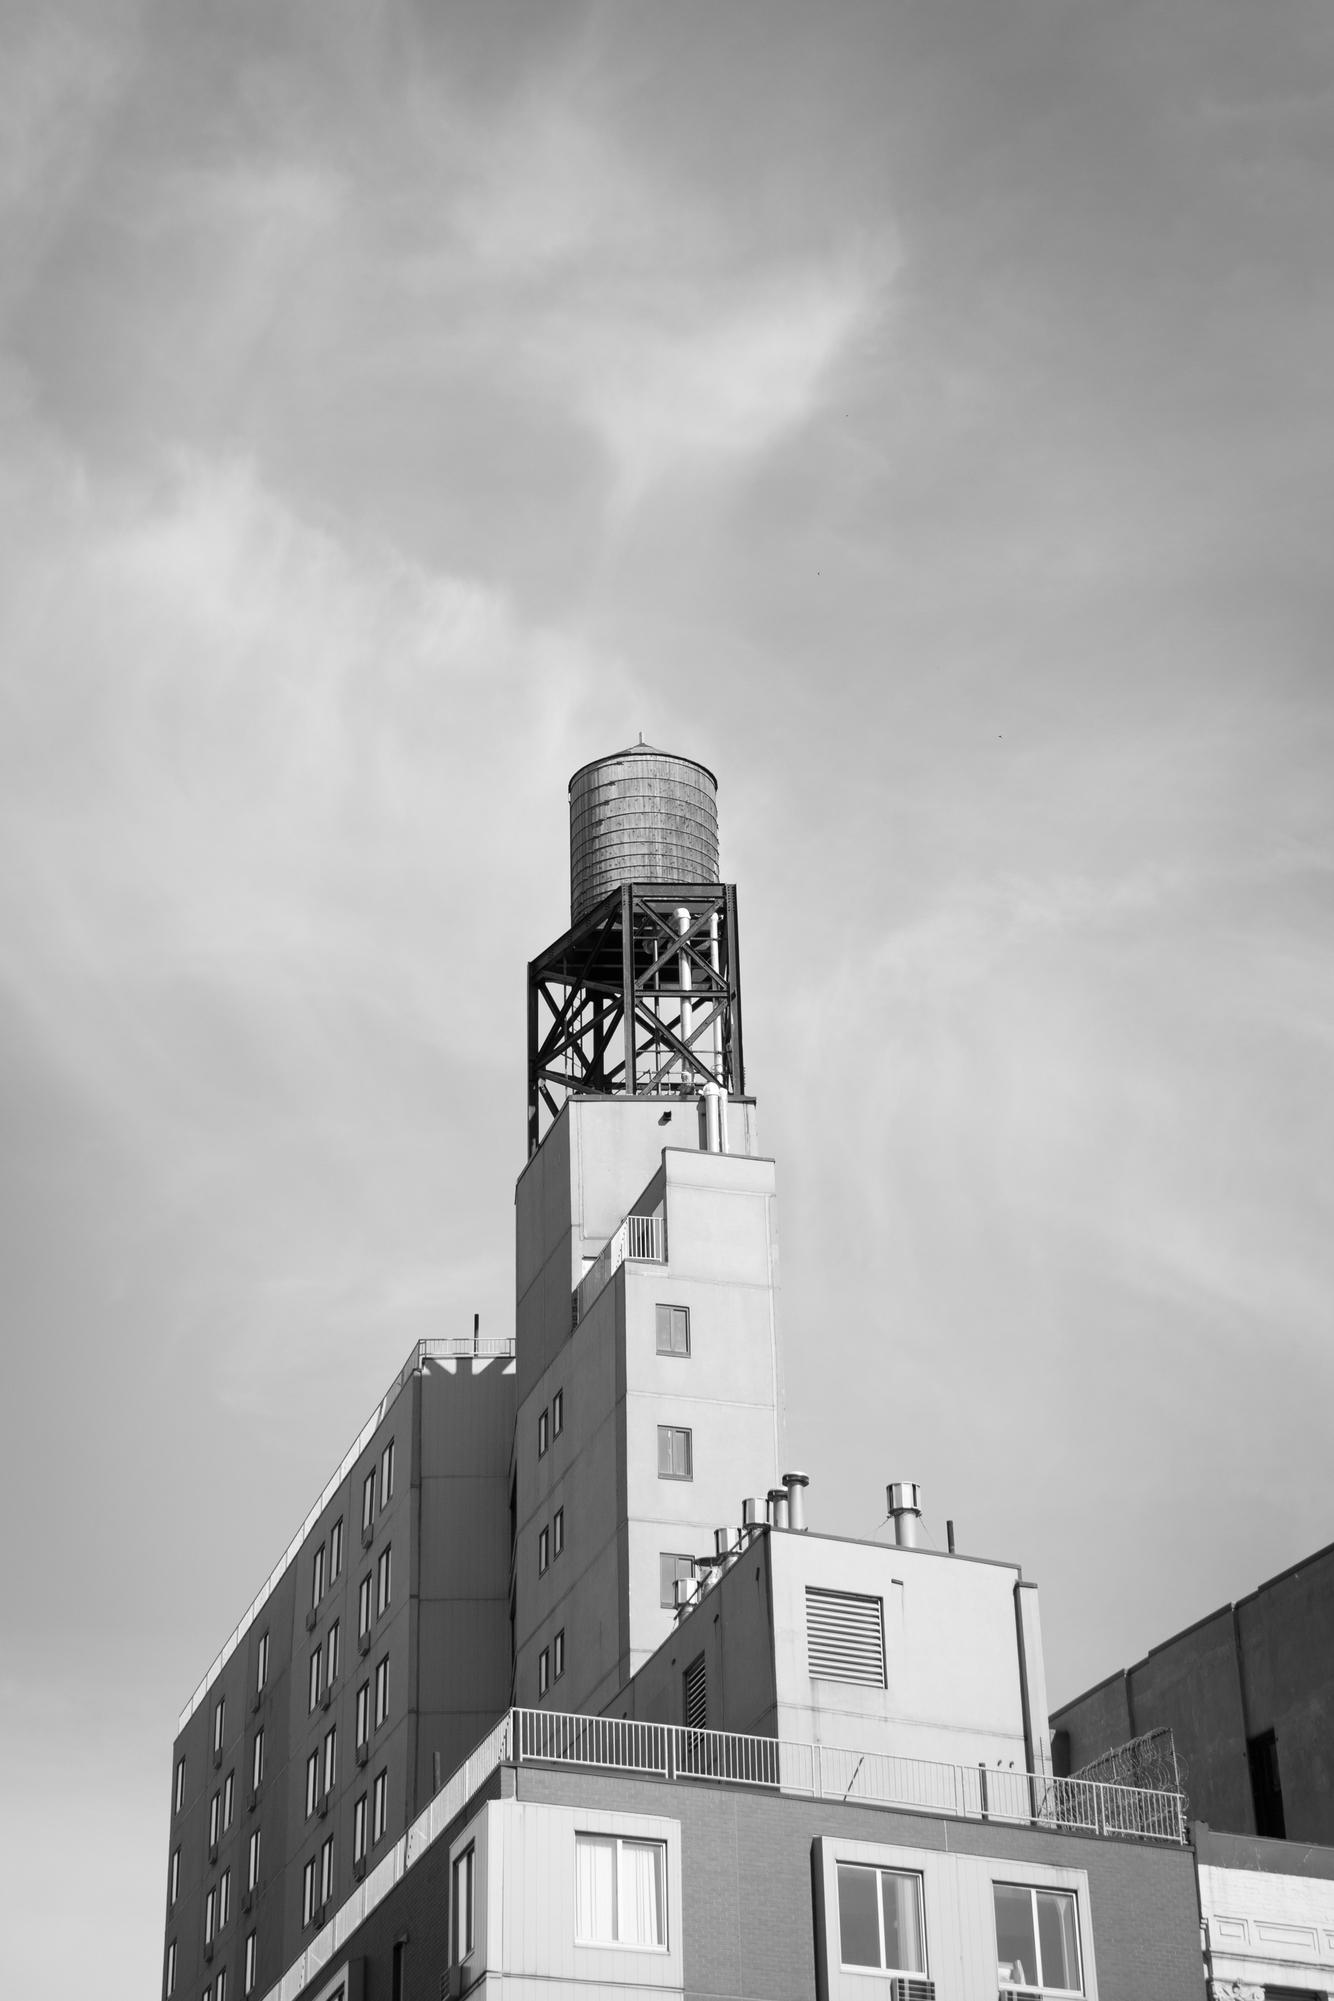 KarenHillPhotography-Wertheim-15-0378.jpg